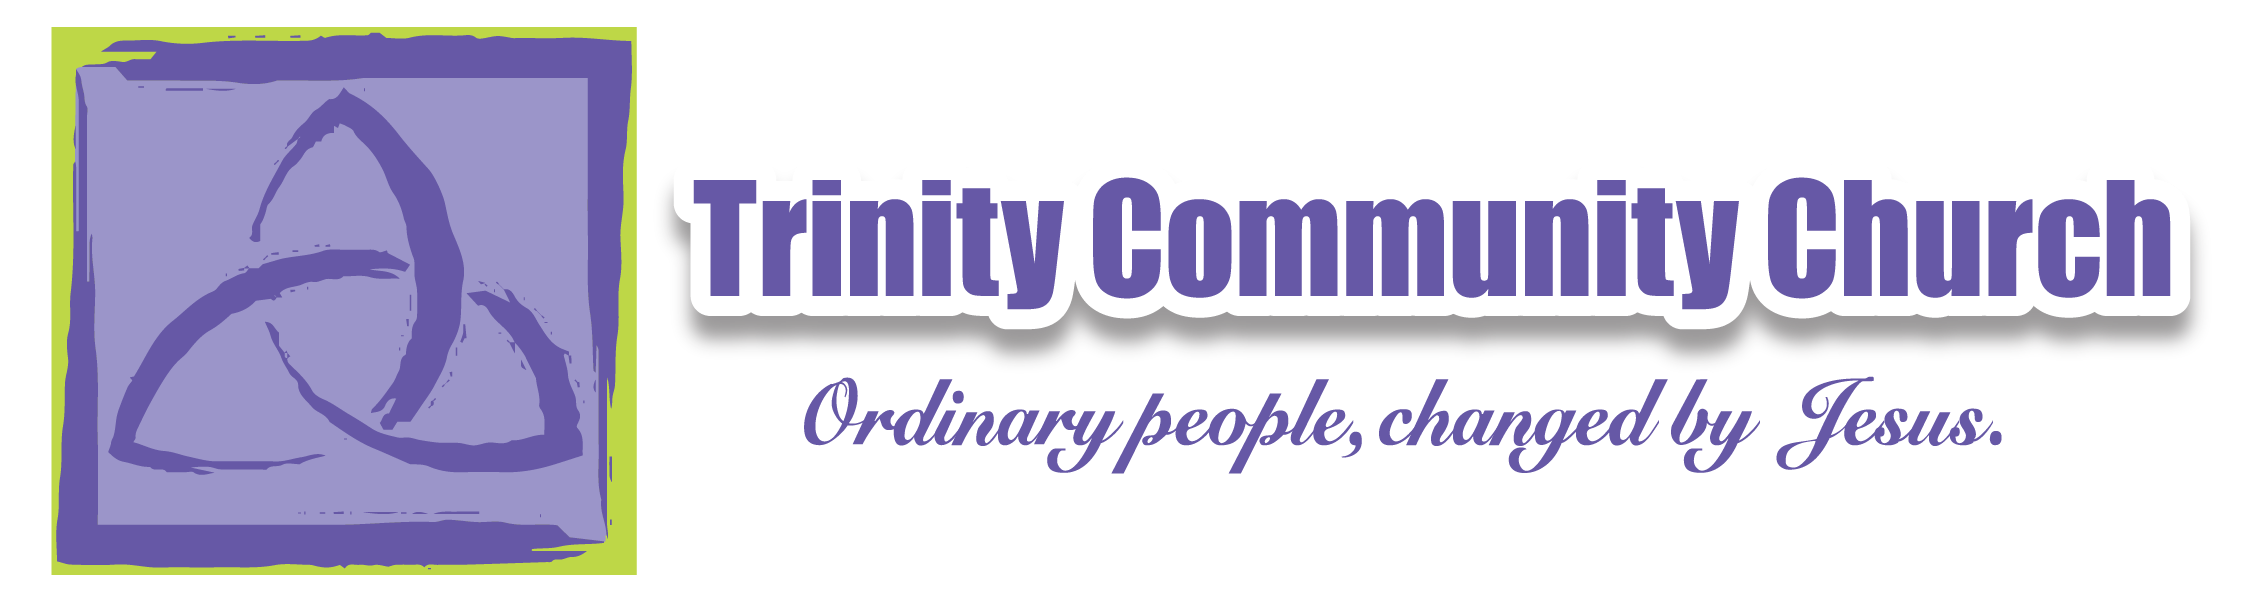 Stu-Trinity Community Church logo